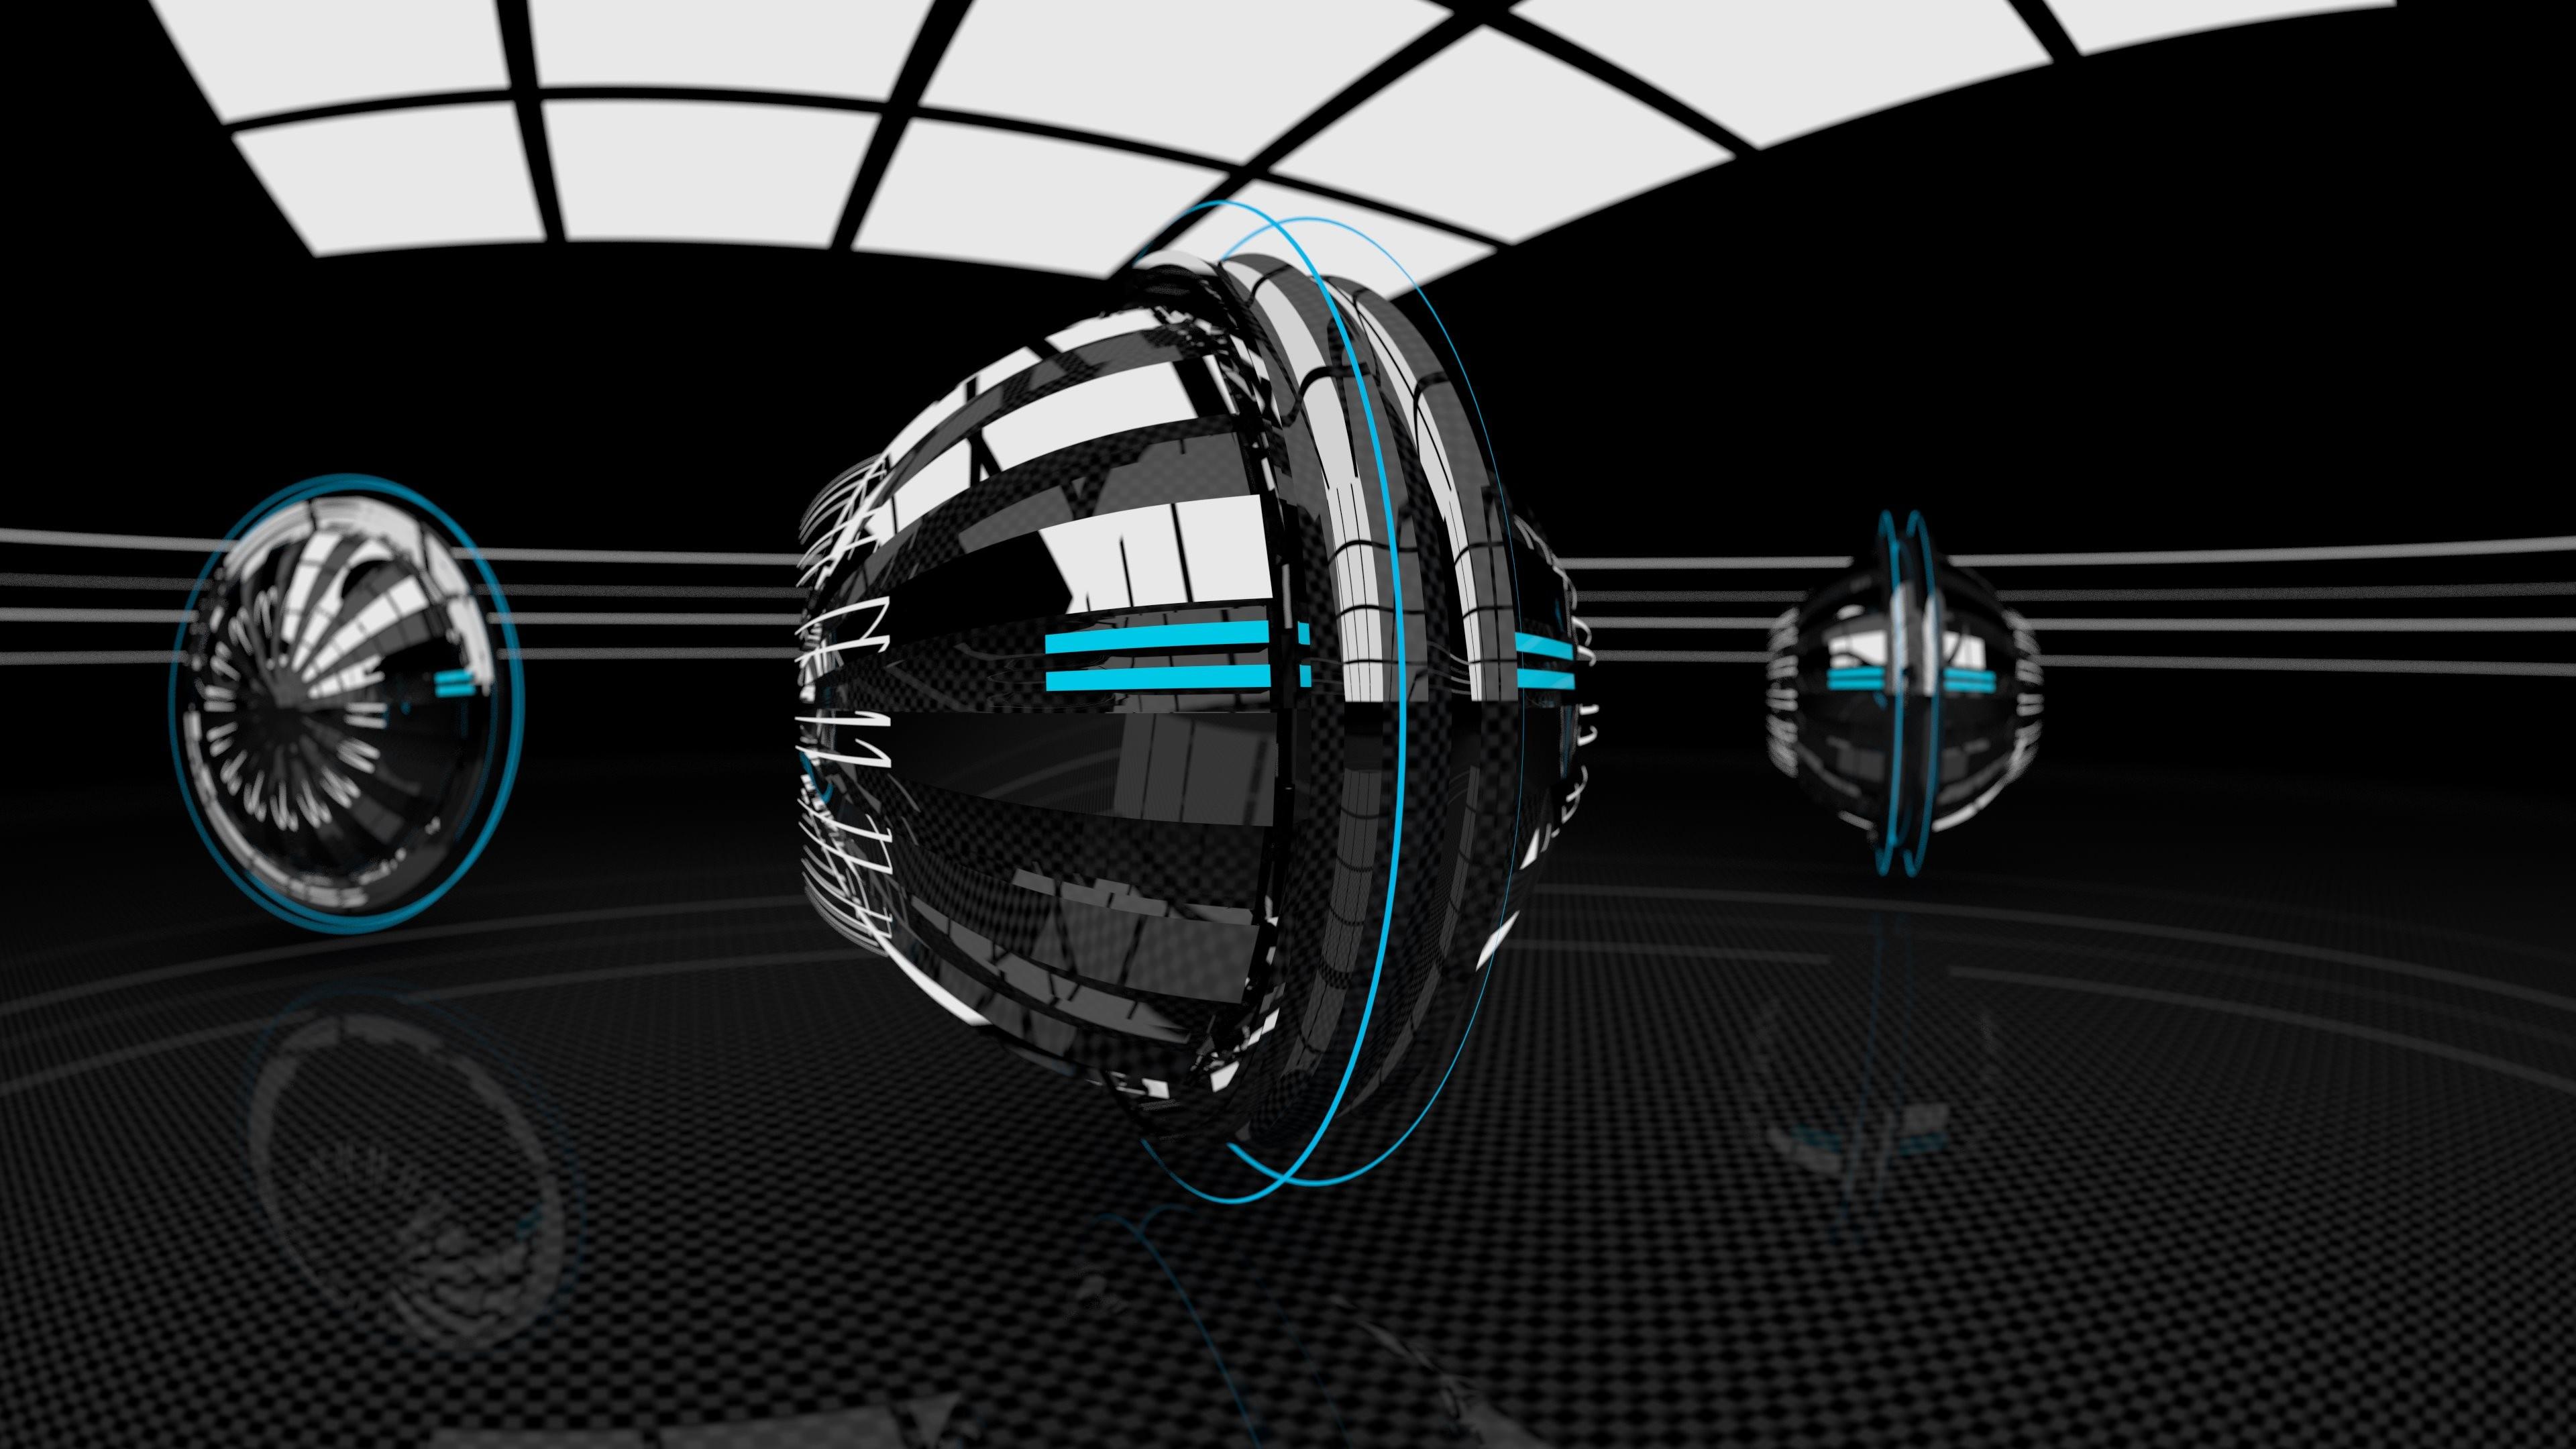 4K HD Wallpaper 2: Abstract 3D Technical Revolution